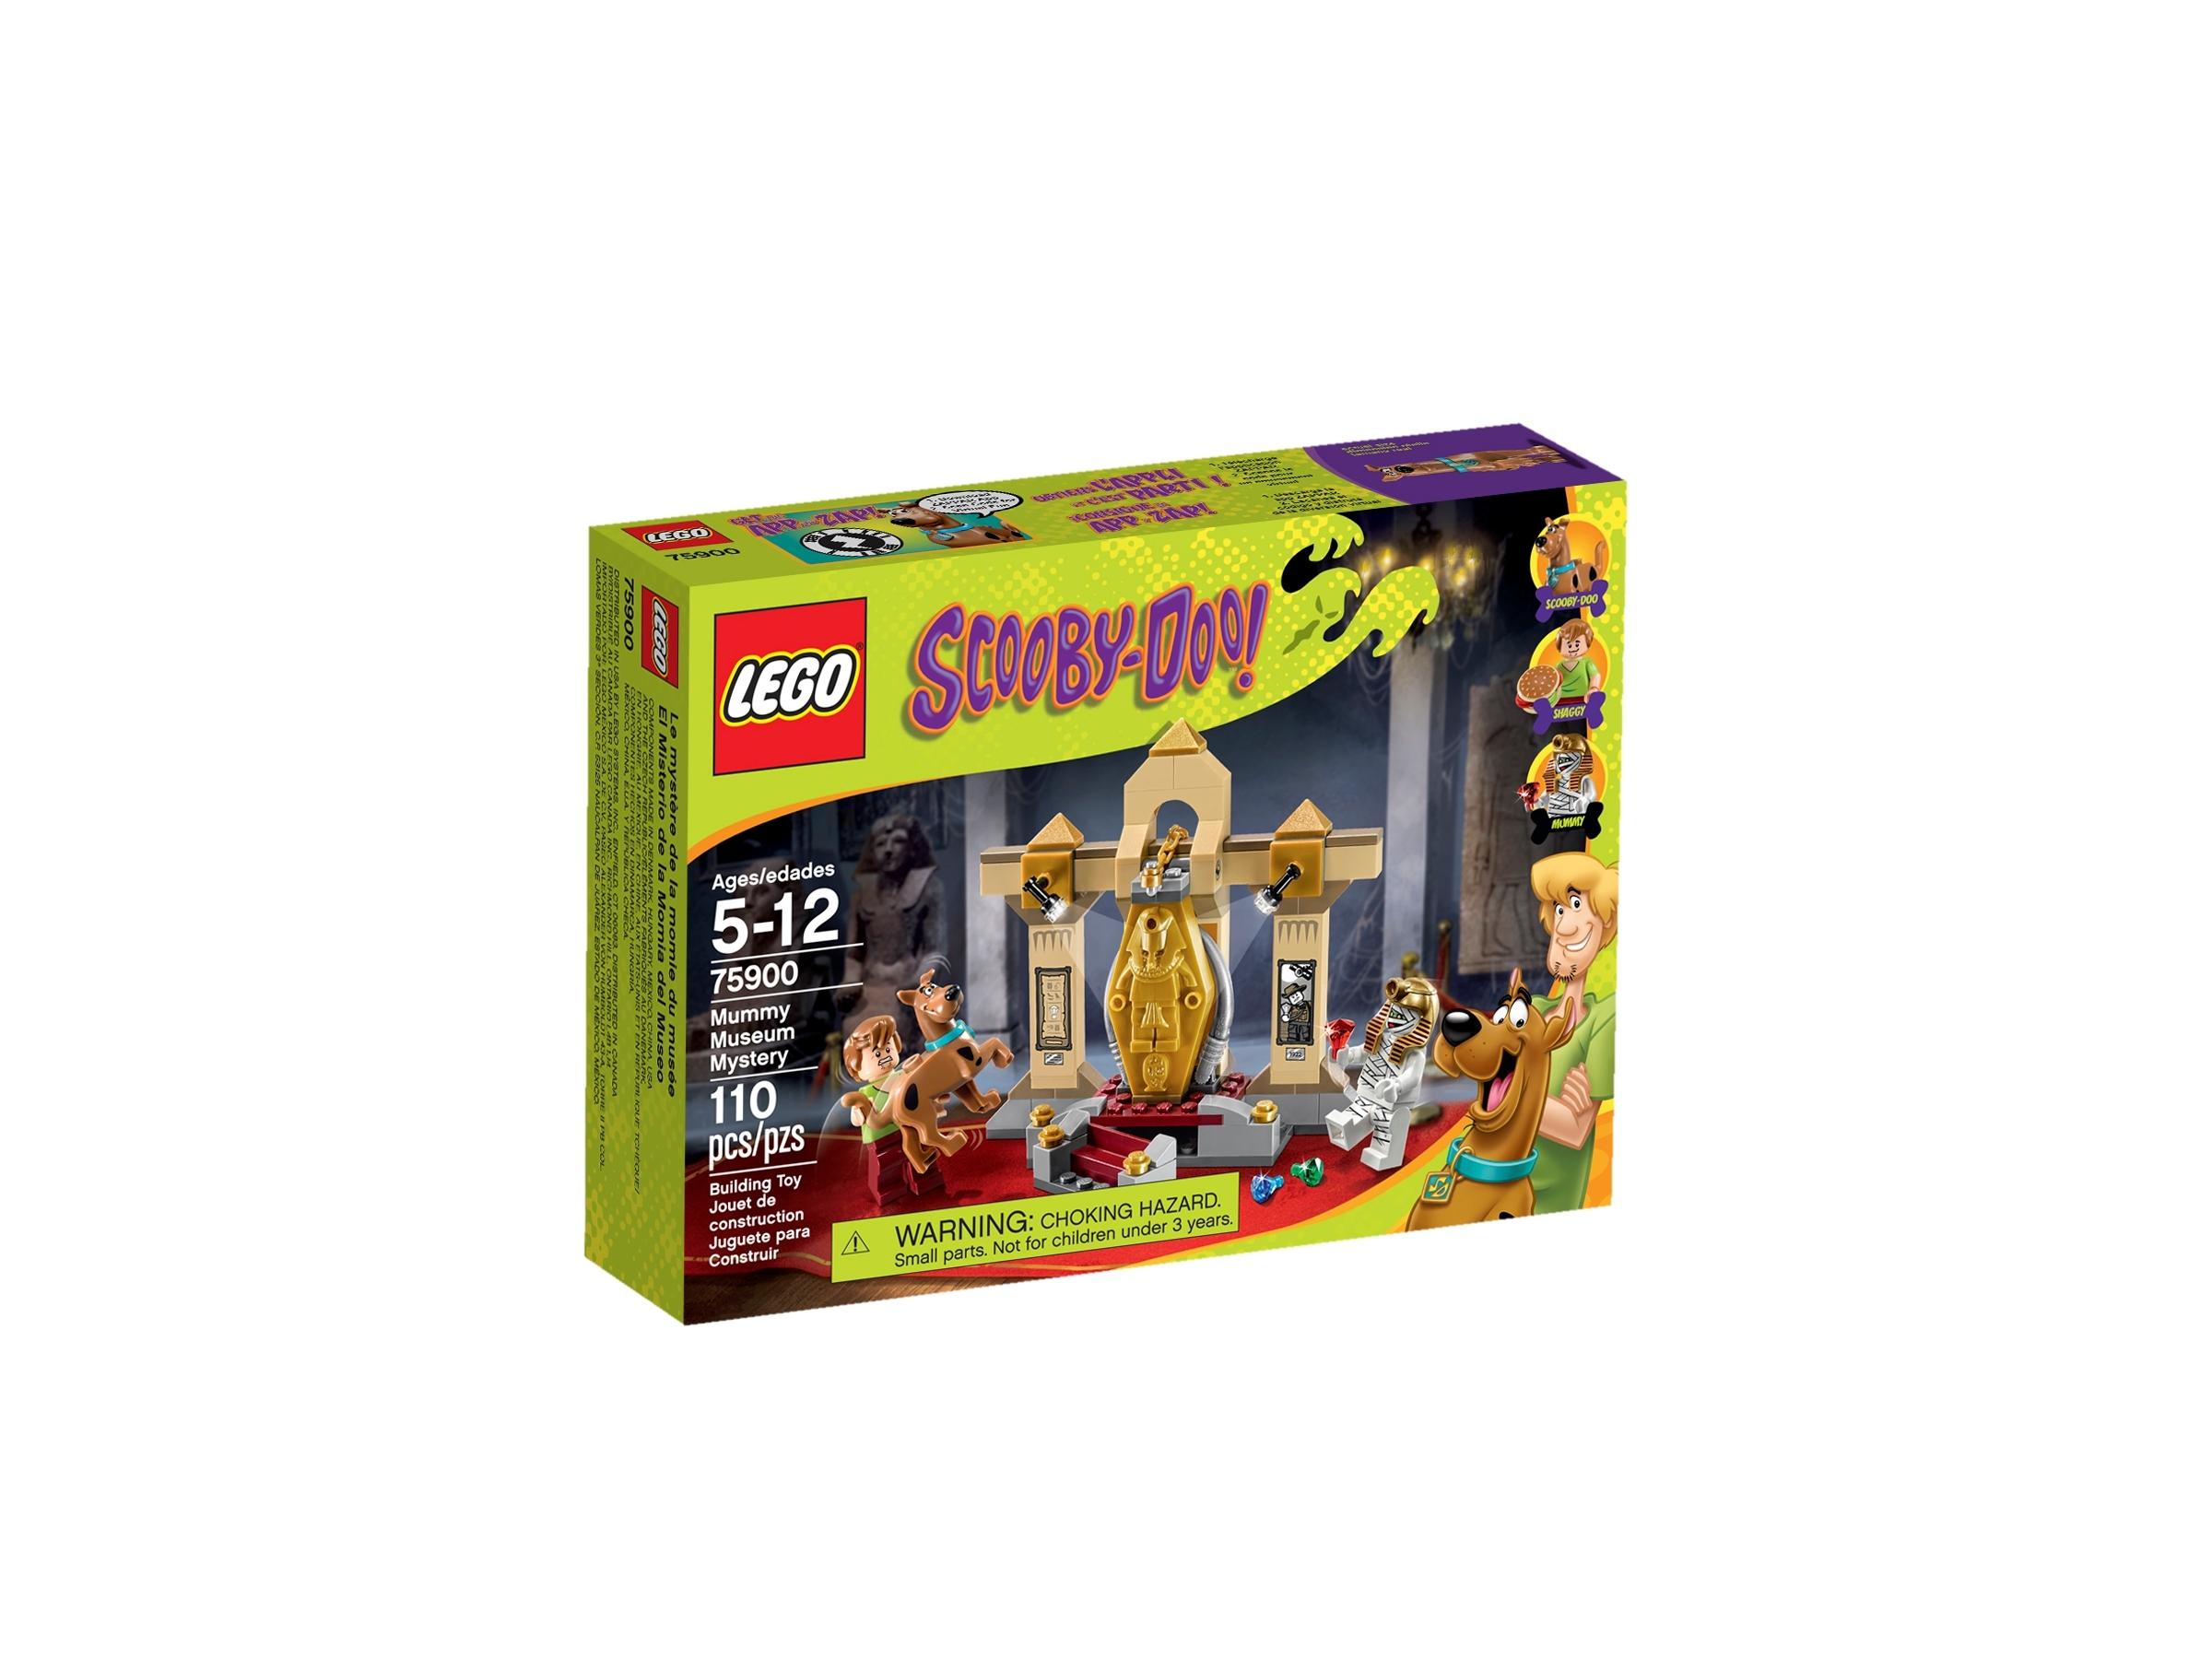 Scooby-Doo Series 75900 Lego Scooby-Doo Minifigure BRAND NEW